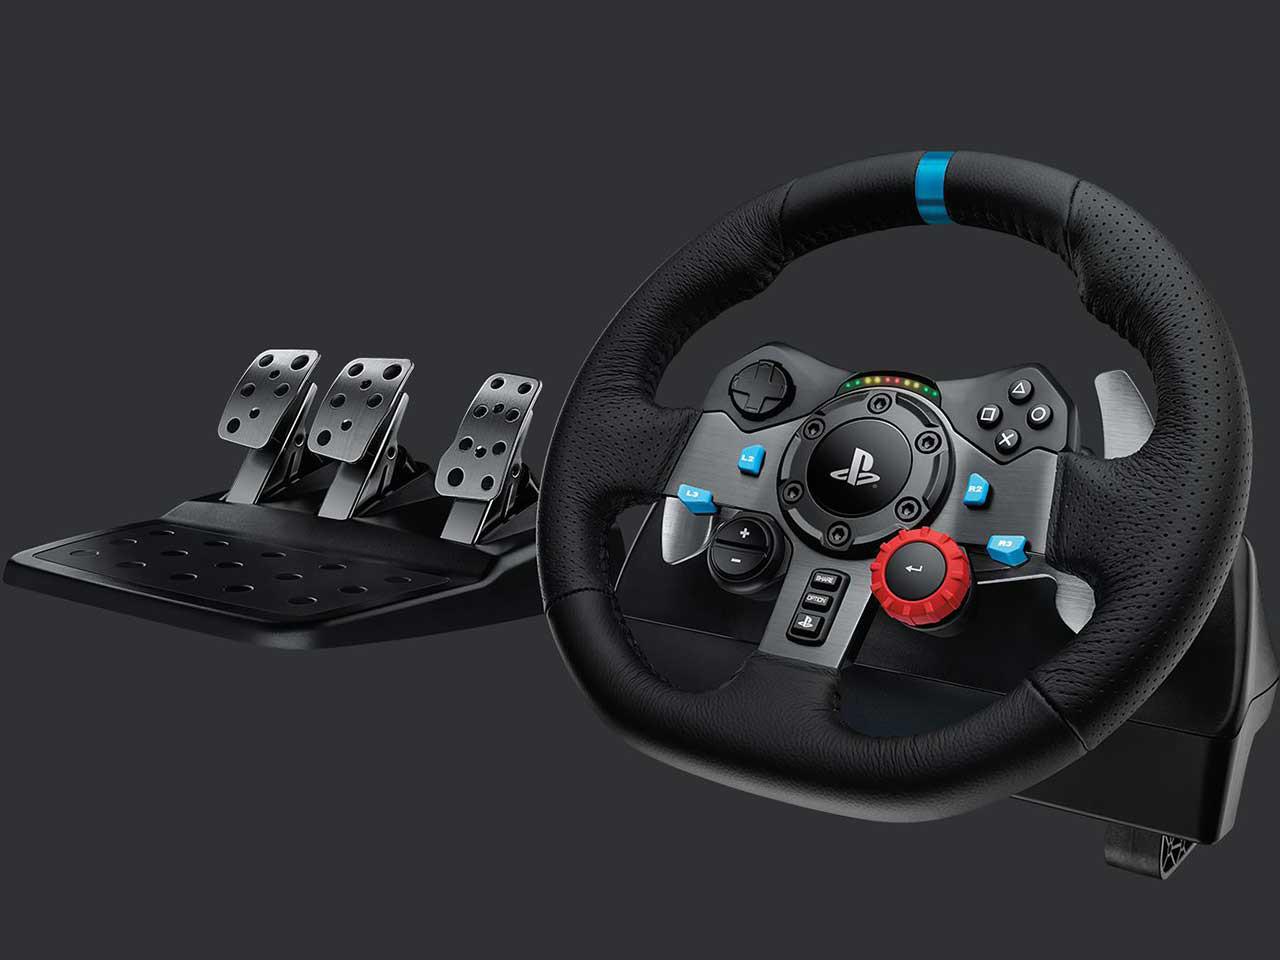 Logitech G29 Driving Force Race Wheel 10 1 - فرمان بازی لاجیتک مدل G29 Driving Force مخصوص PS4/PC